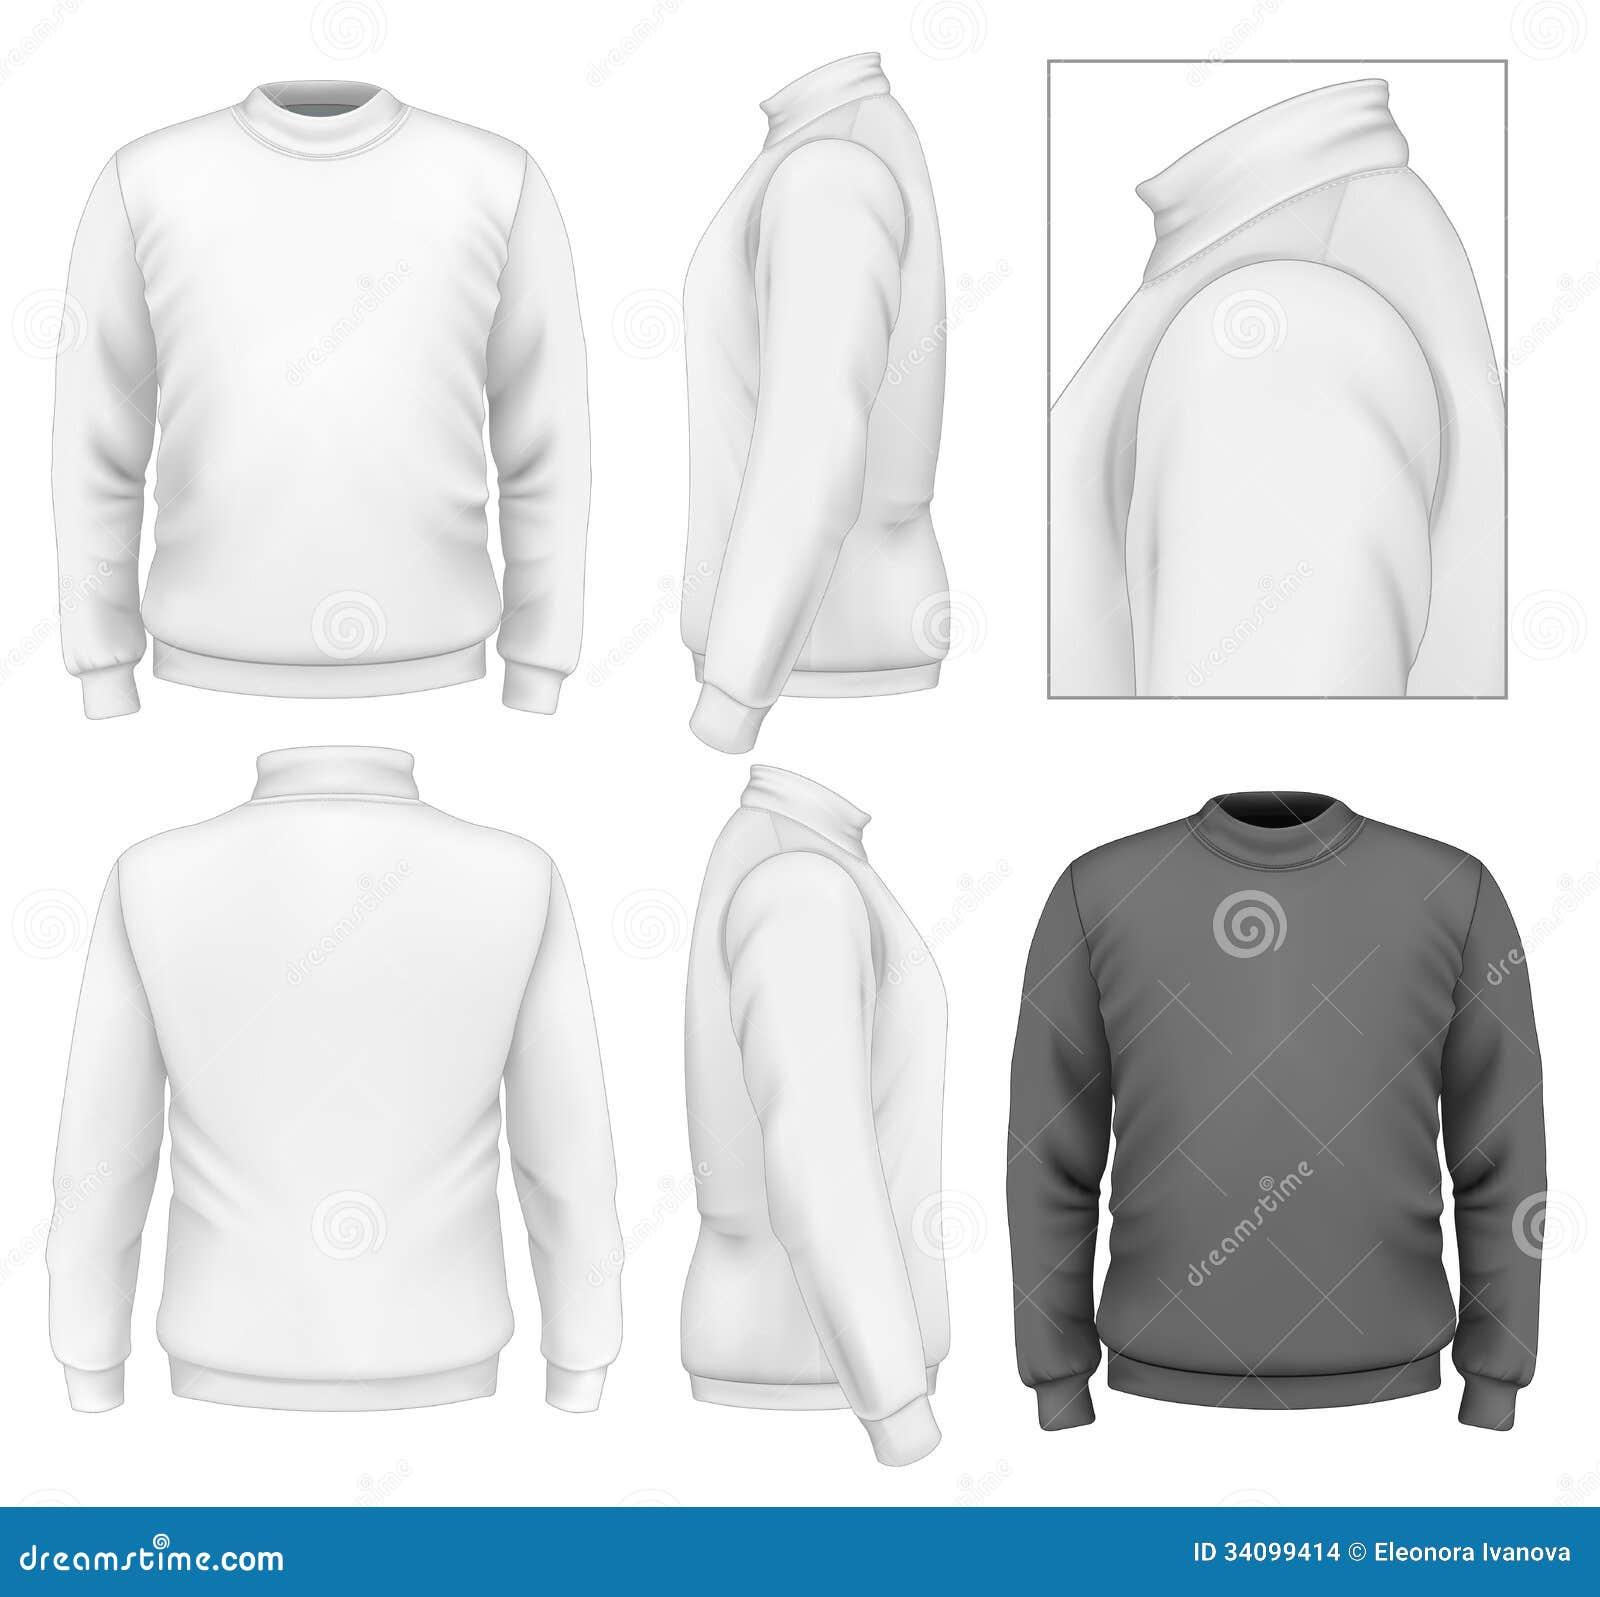 sweatshirt design template - Black.dgfitness.co